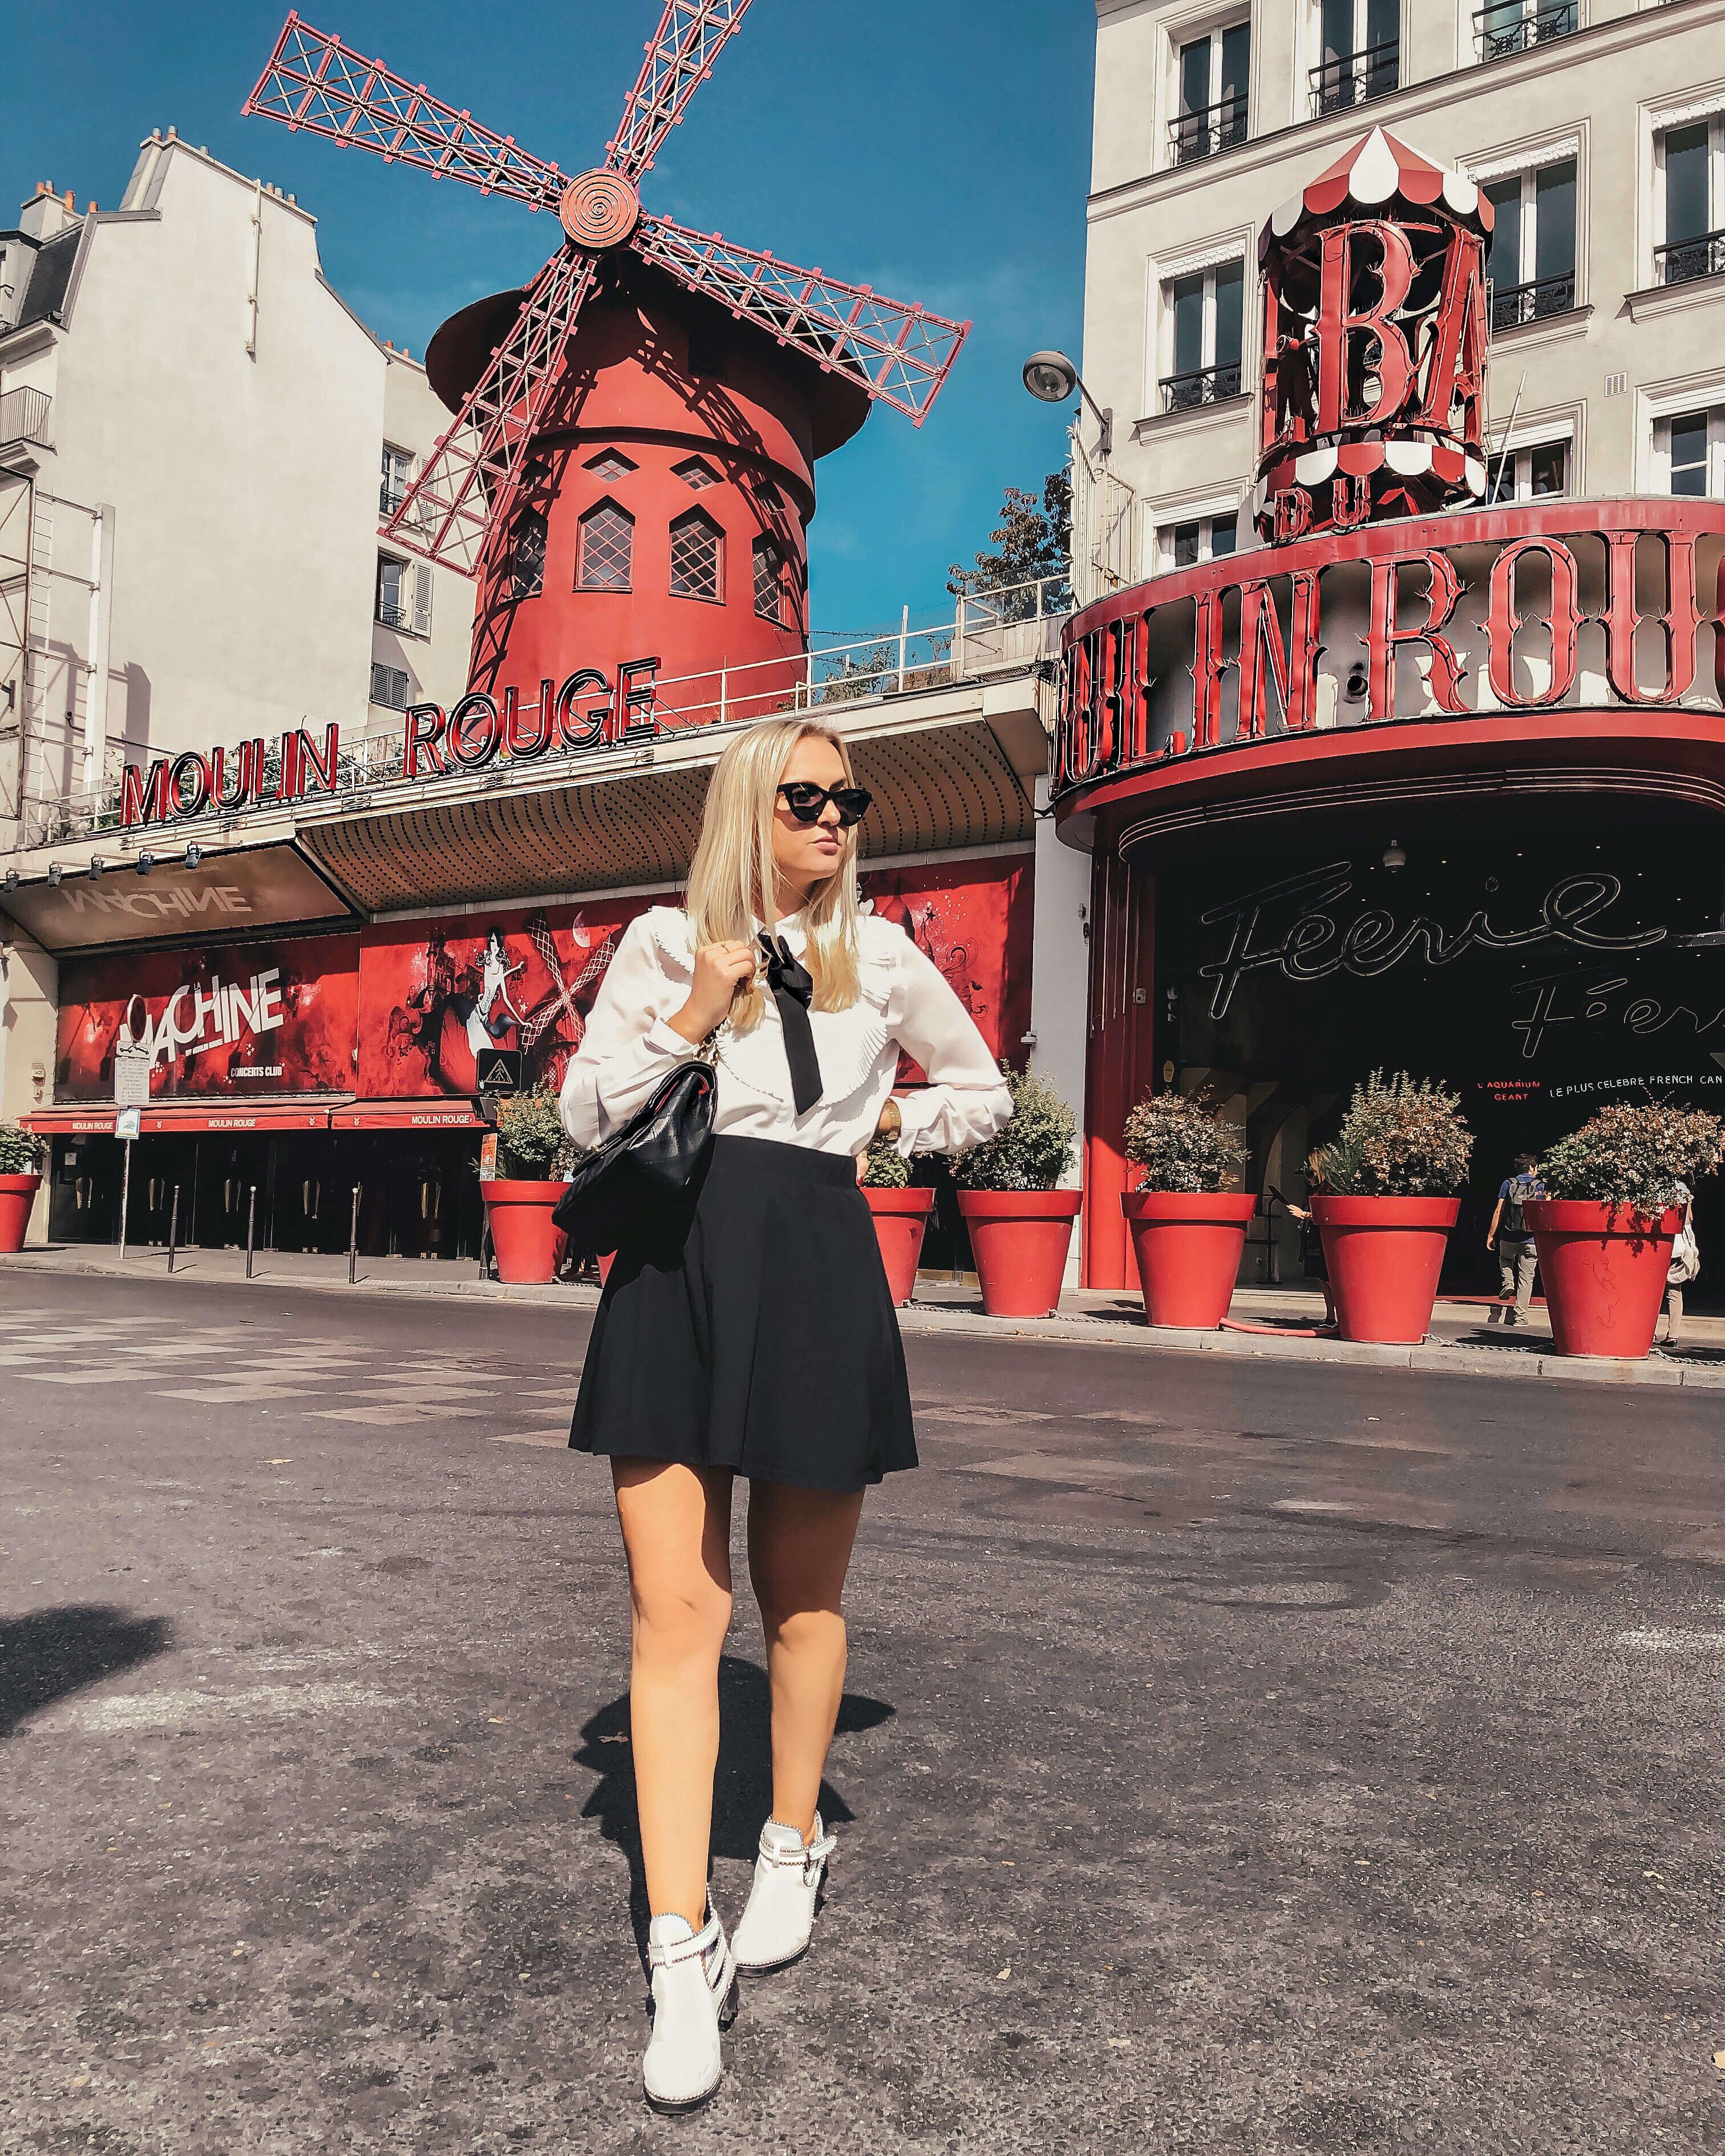 Paris, Frankreich, Sehenswürdigkeiten Paris, Reisetipps, Eiffelturm, Moulin Rouge, Louvree, Reiseblog, Travelblog, Katefully, München, Motel One, Sacre Coure, Port Alexandre, Reisebericht